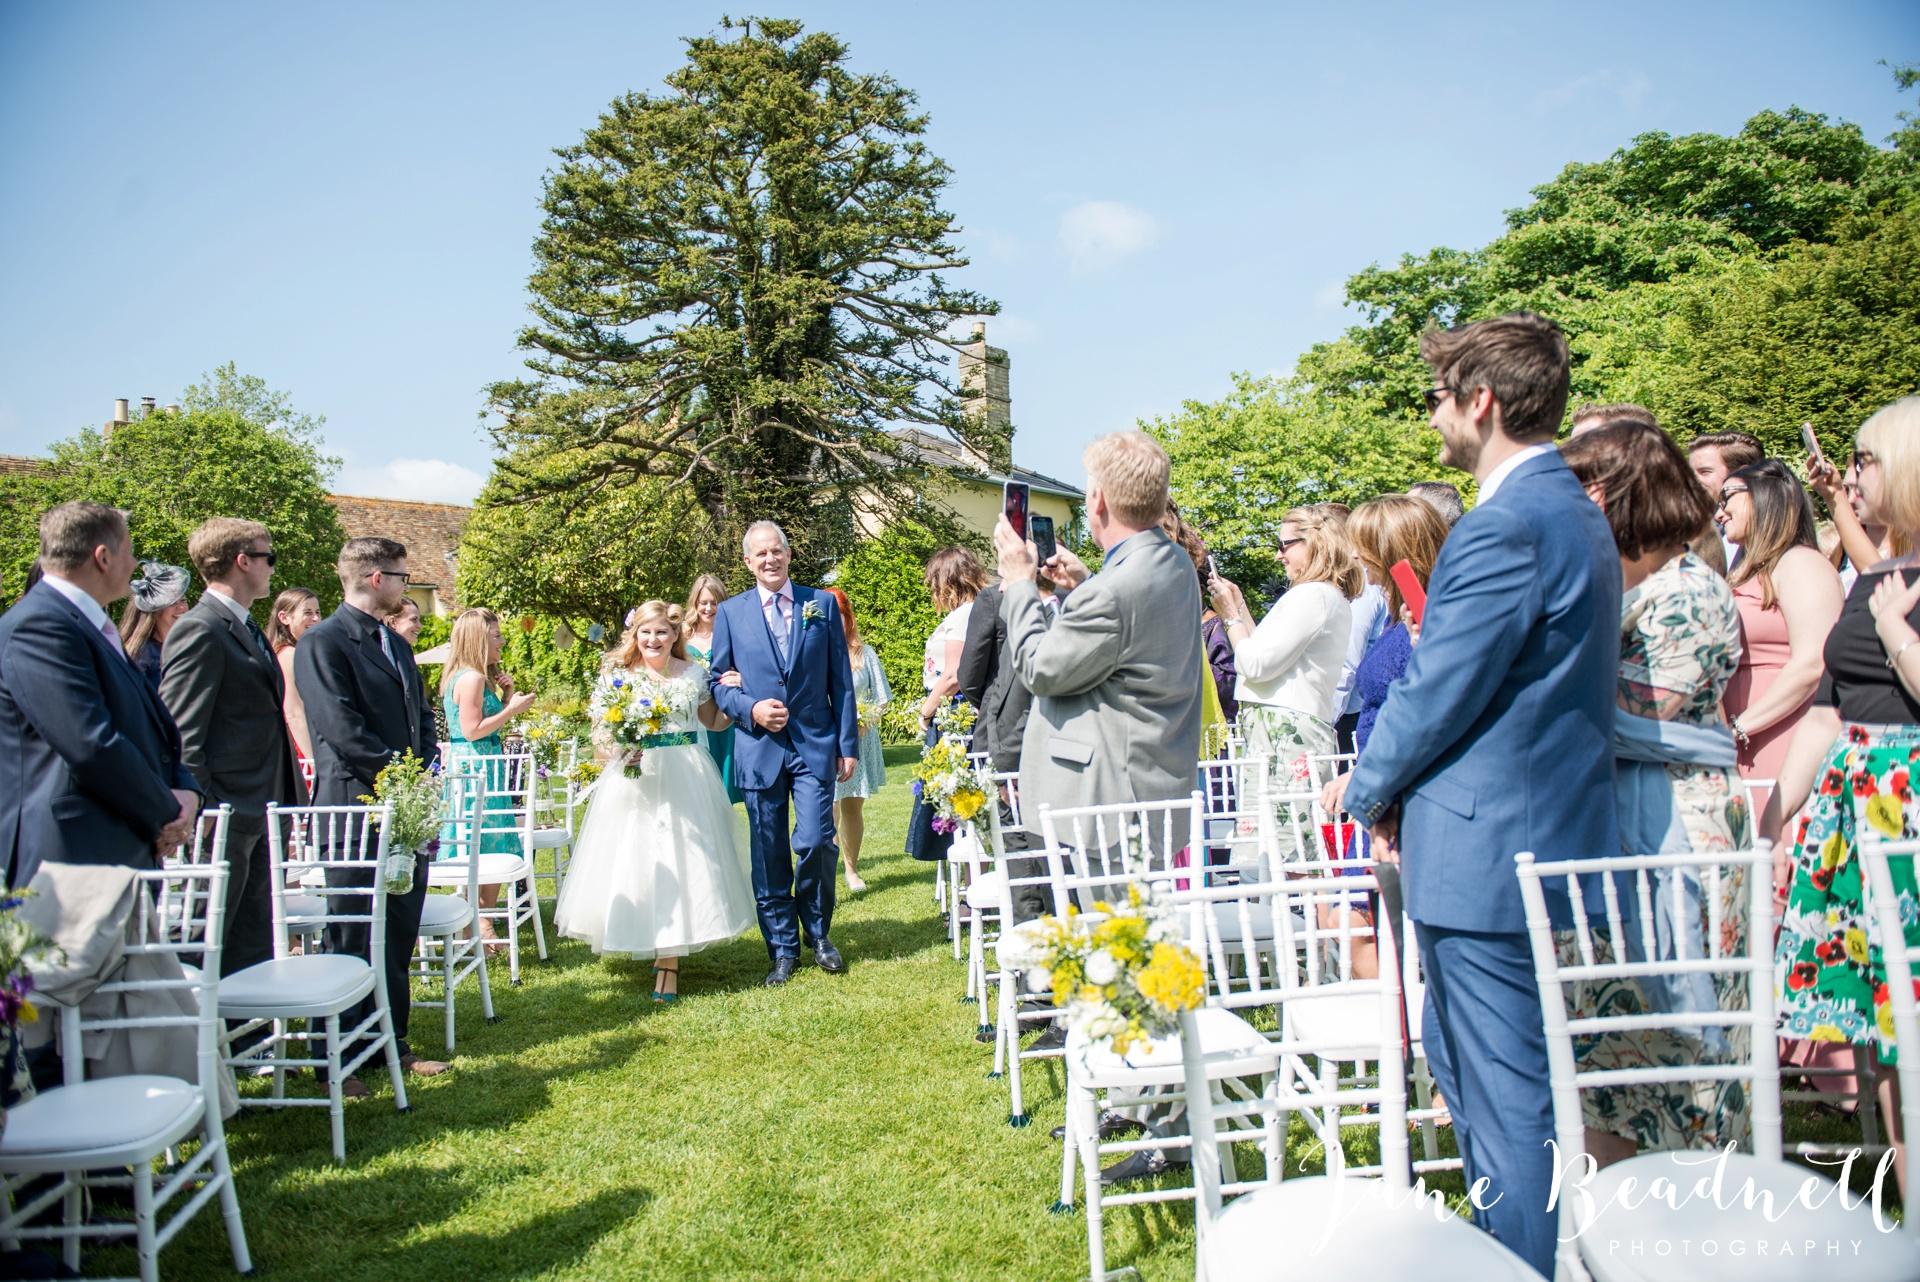 South Farm Wedding photography Hertfordshire by Jane Beadnell Photography fine art wedding photographer_0062